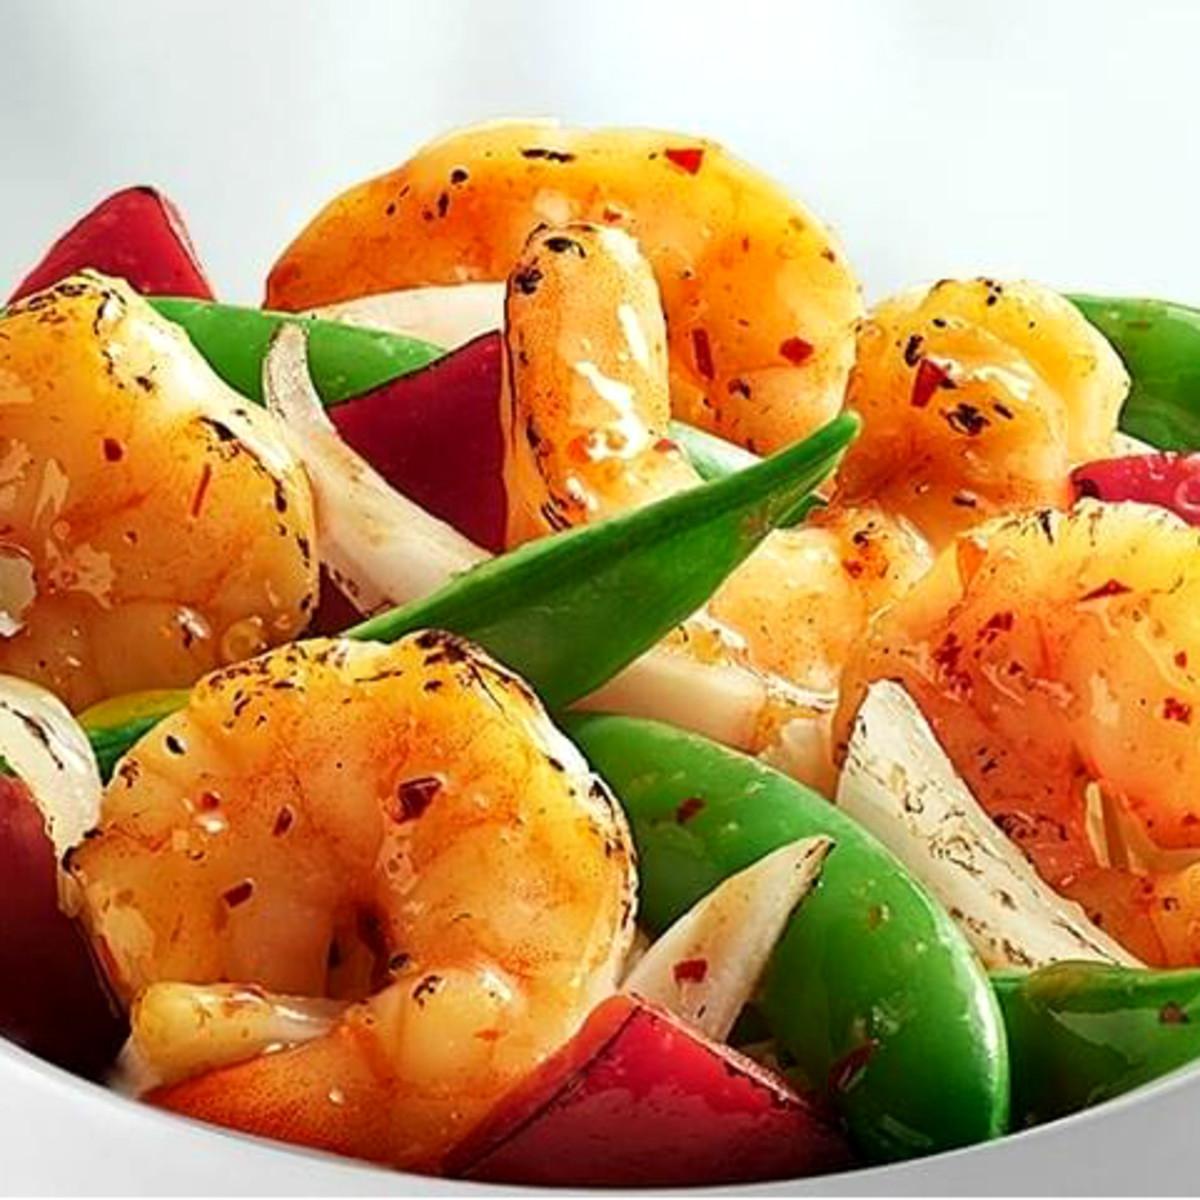 Drive-Thru Gourmet - Panda Express wok fired shrimp